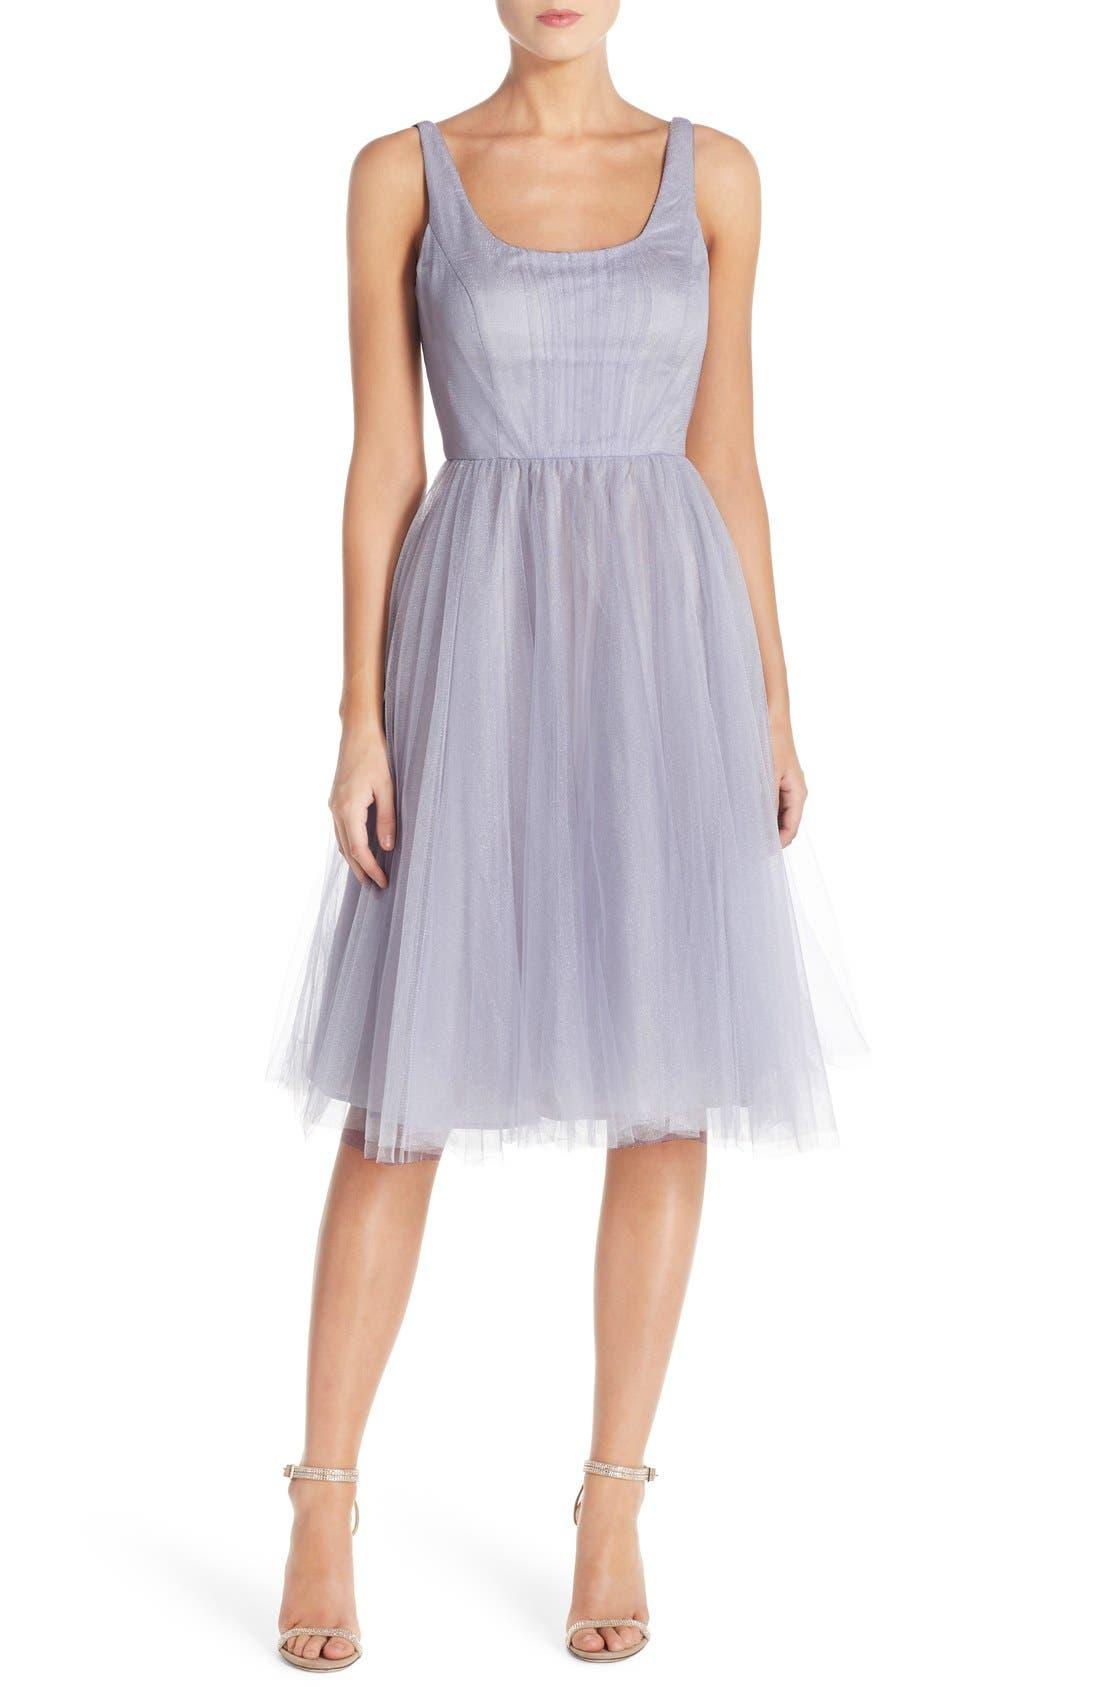 Alternate Image 1 Selected - Donna Morgan 'Chantal' Tulle Fit & Flare Midi Dress